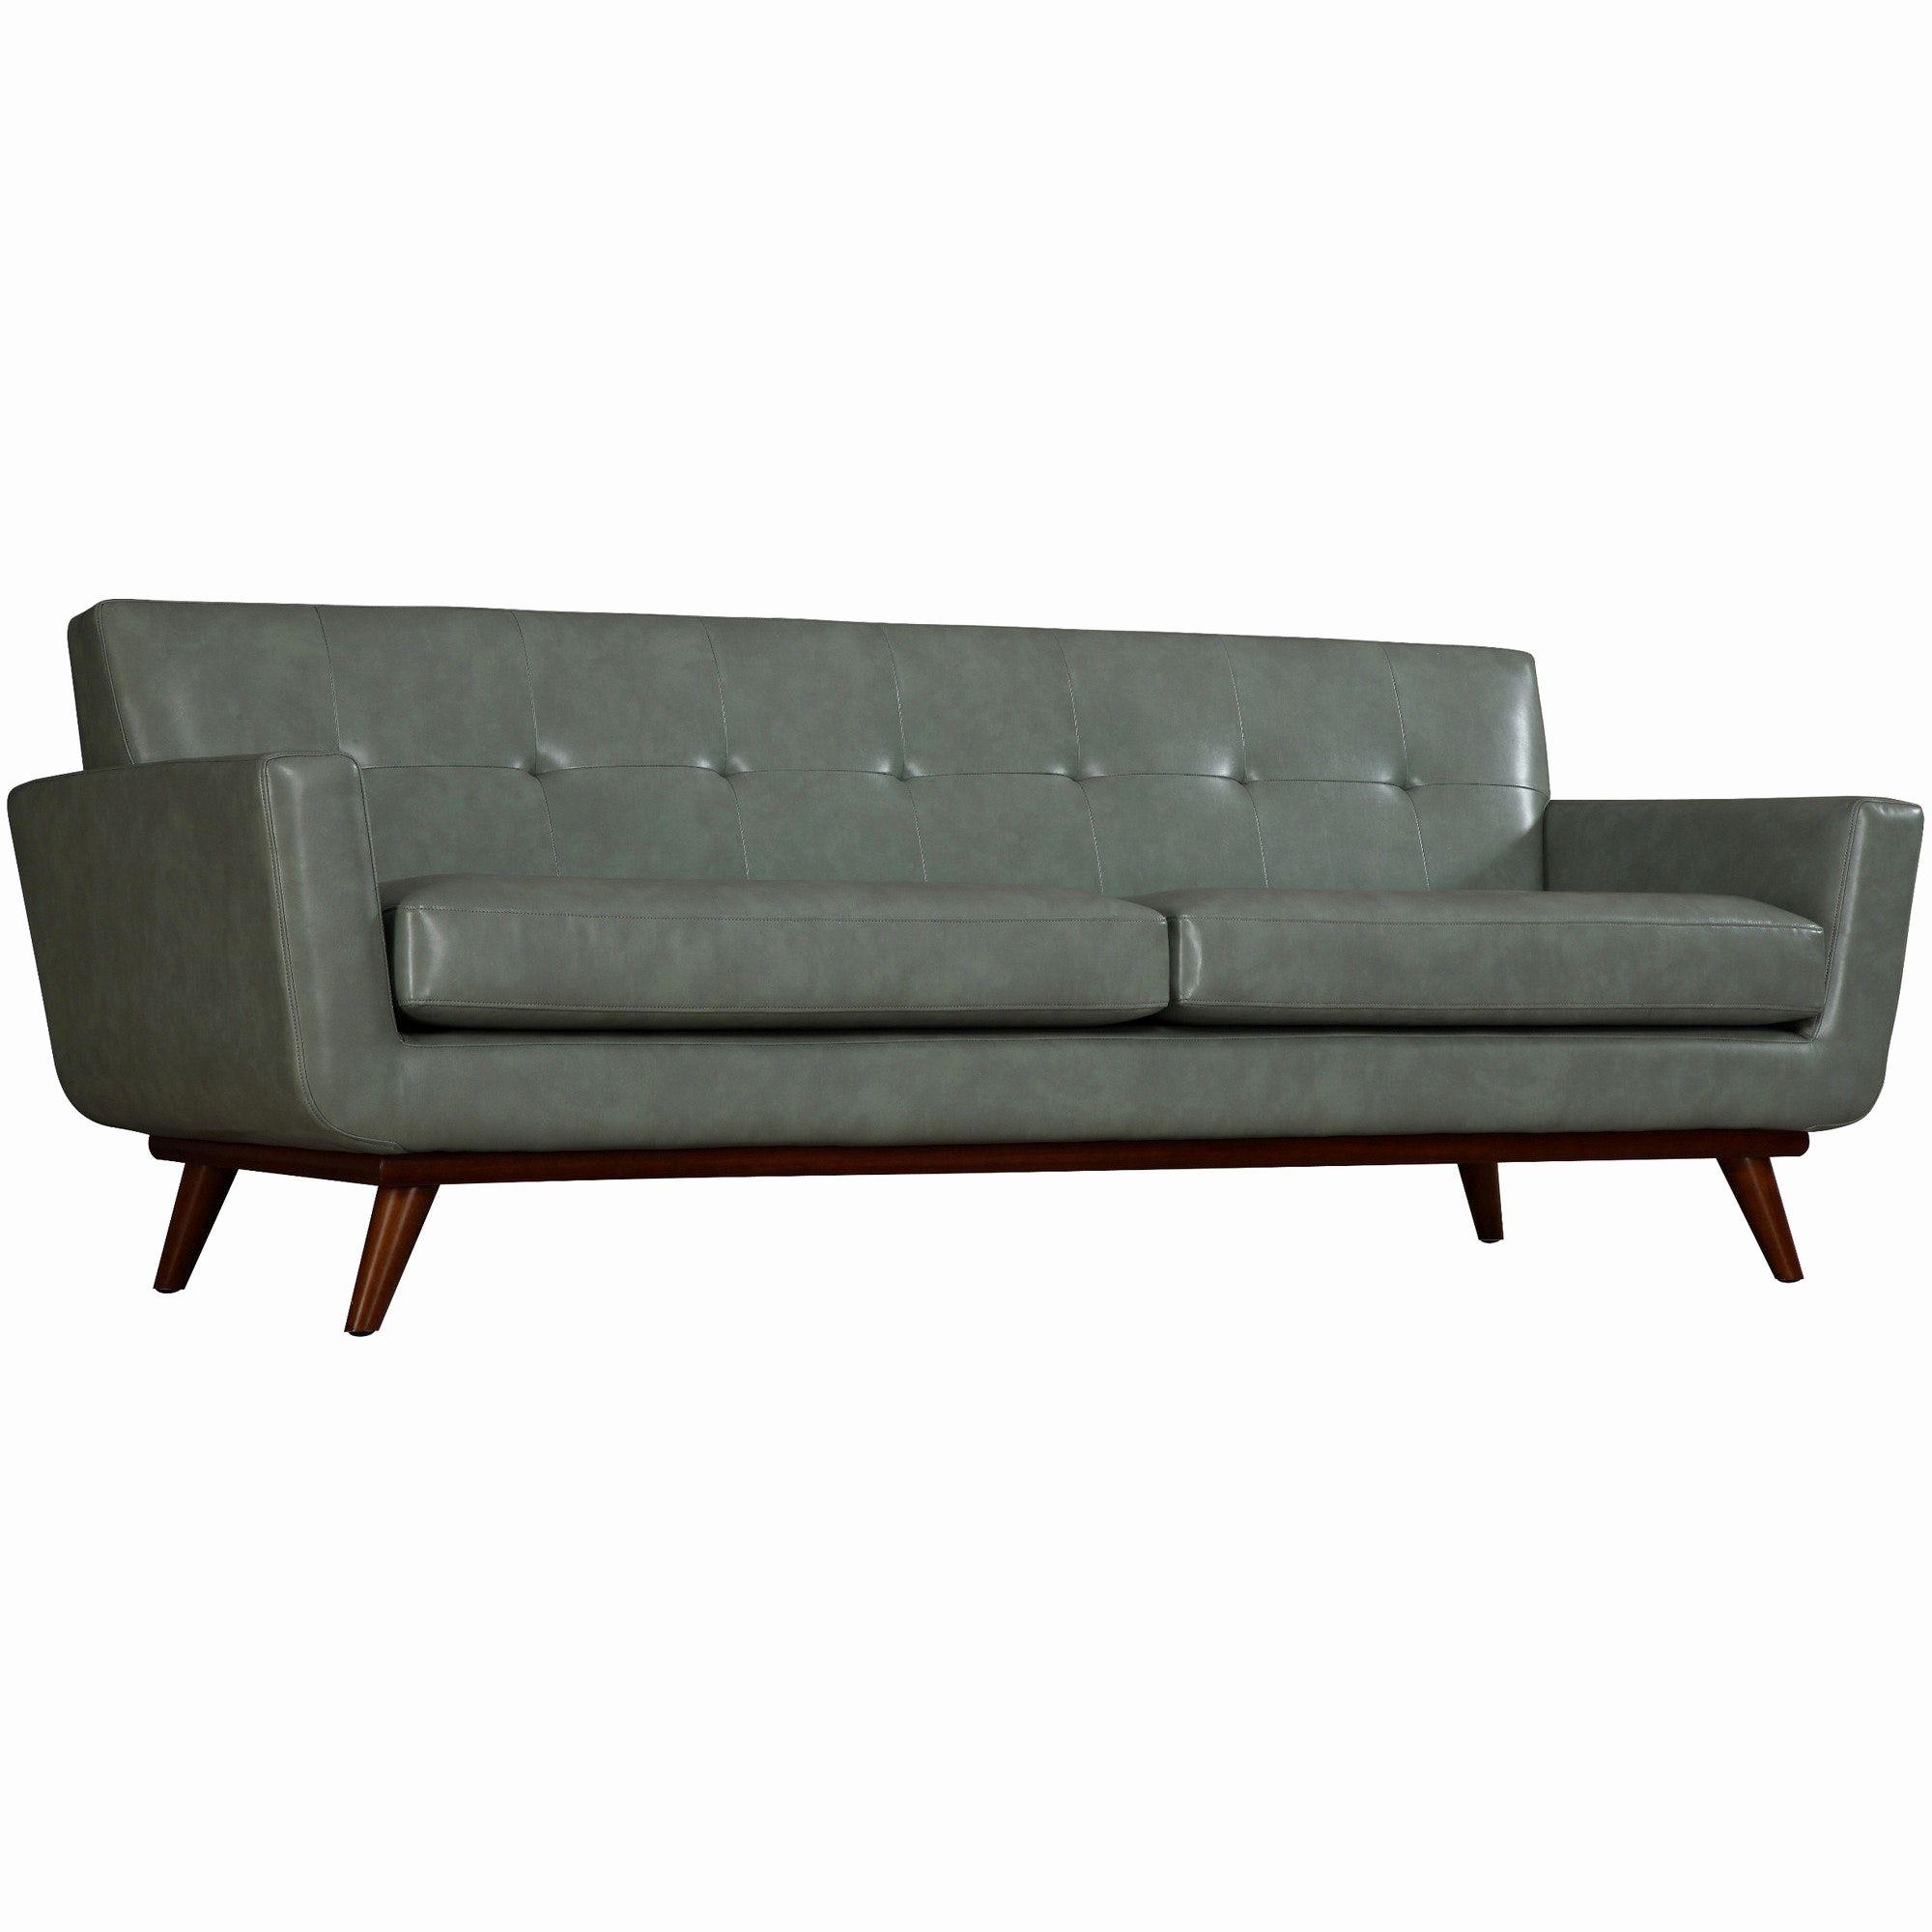 Ideas Office Leather sofa Pics chair classy breathtaking ...